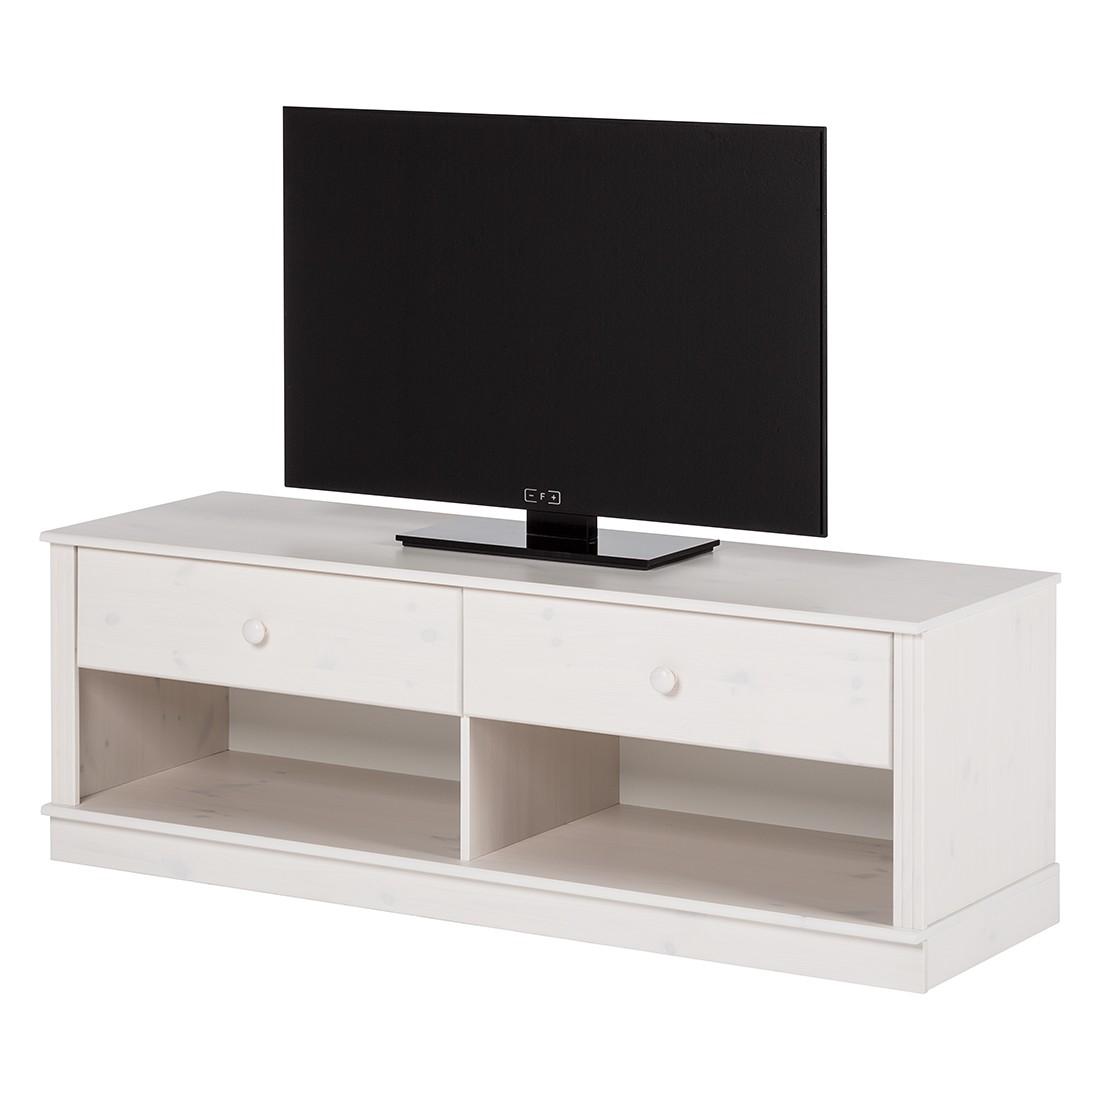 Home 24 - Meuble tv lillehammer i - pin massif - epicéa blanc, maison belfort